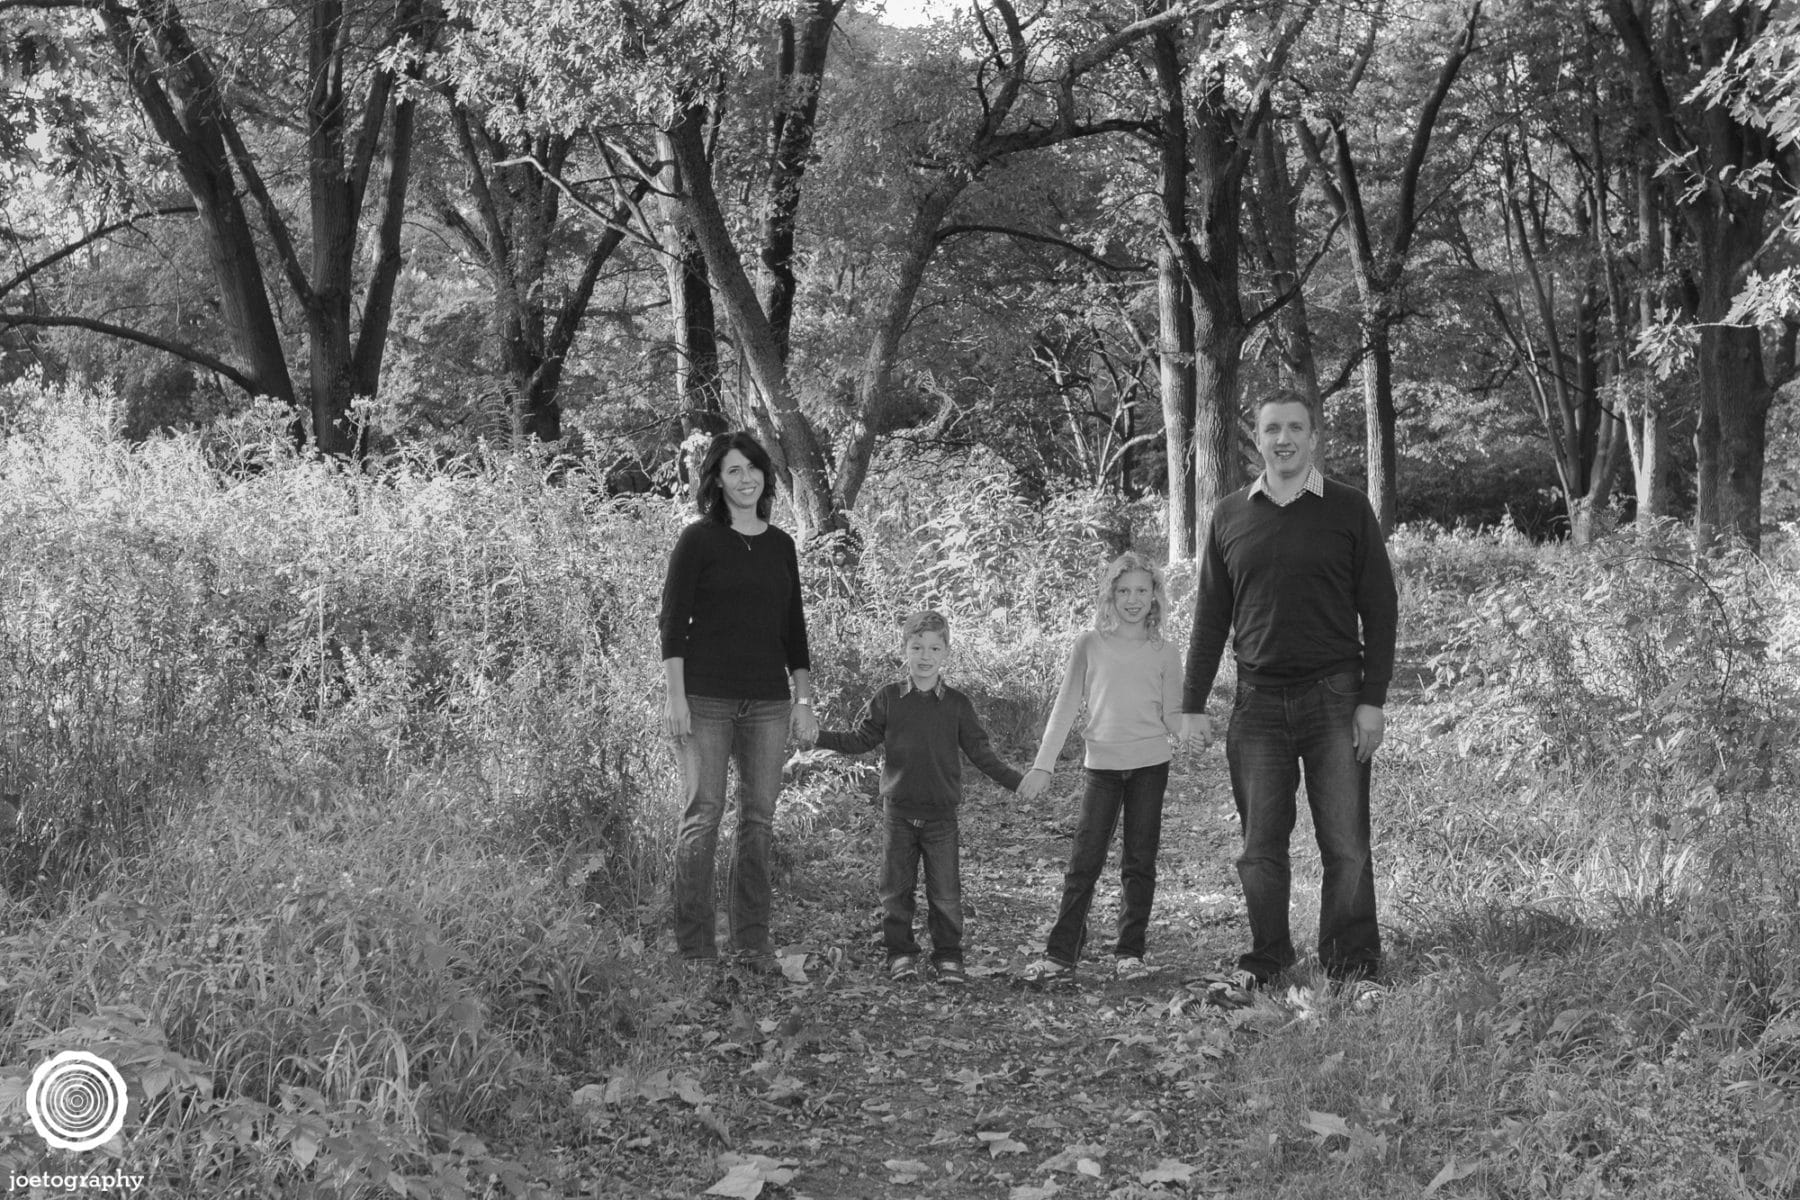 gose-family-photographs-holliday-park-indianapolis-21